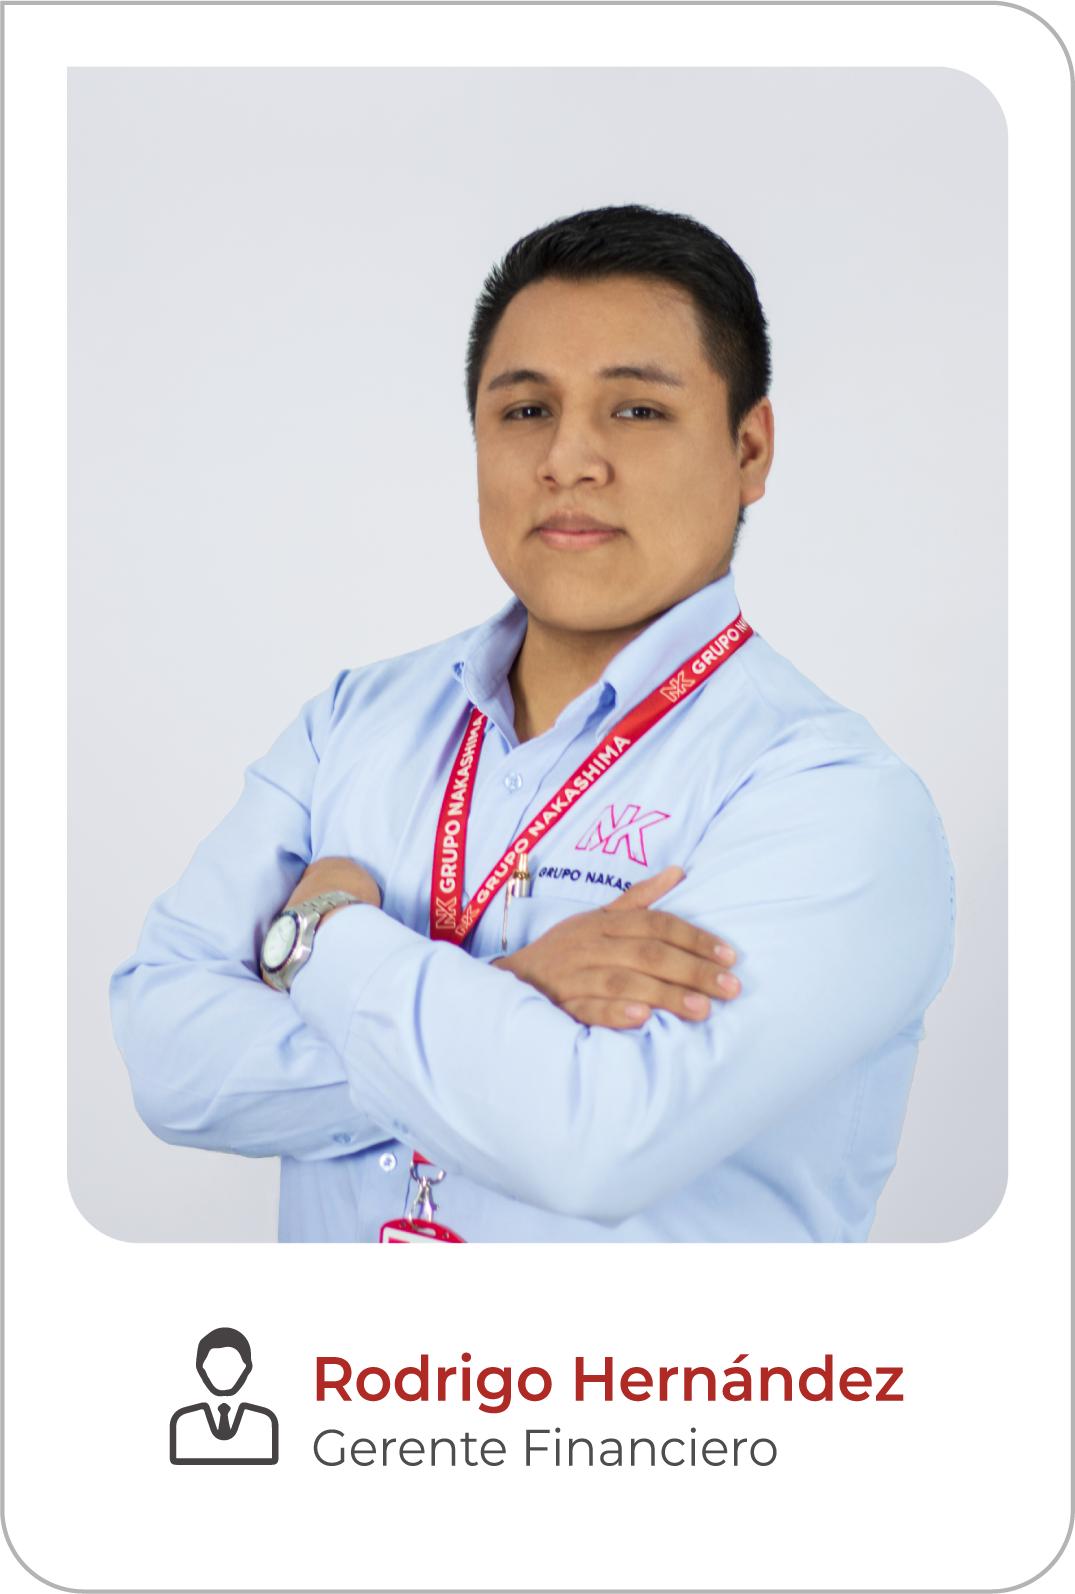 web 2021_Personal - Rodrigo Hernandez